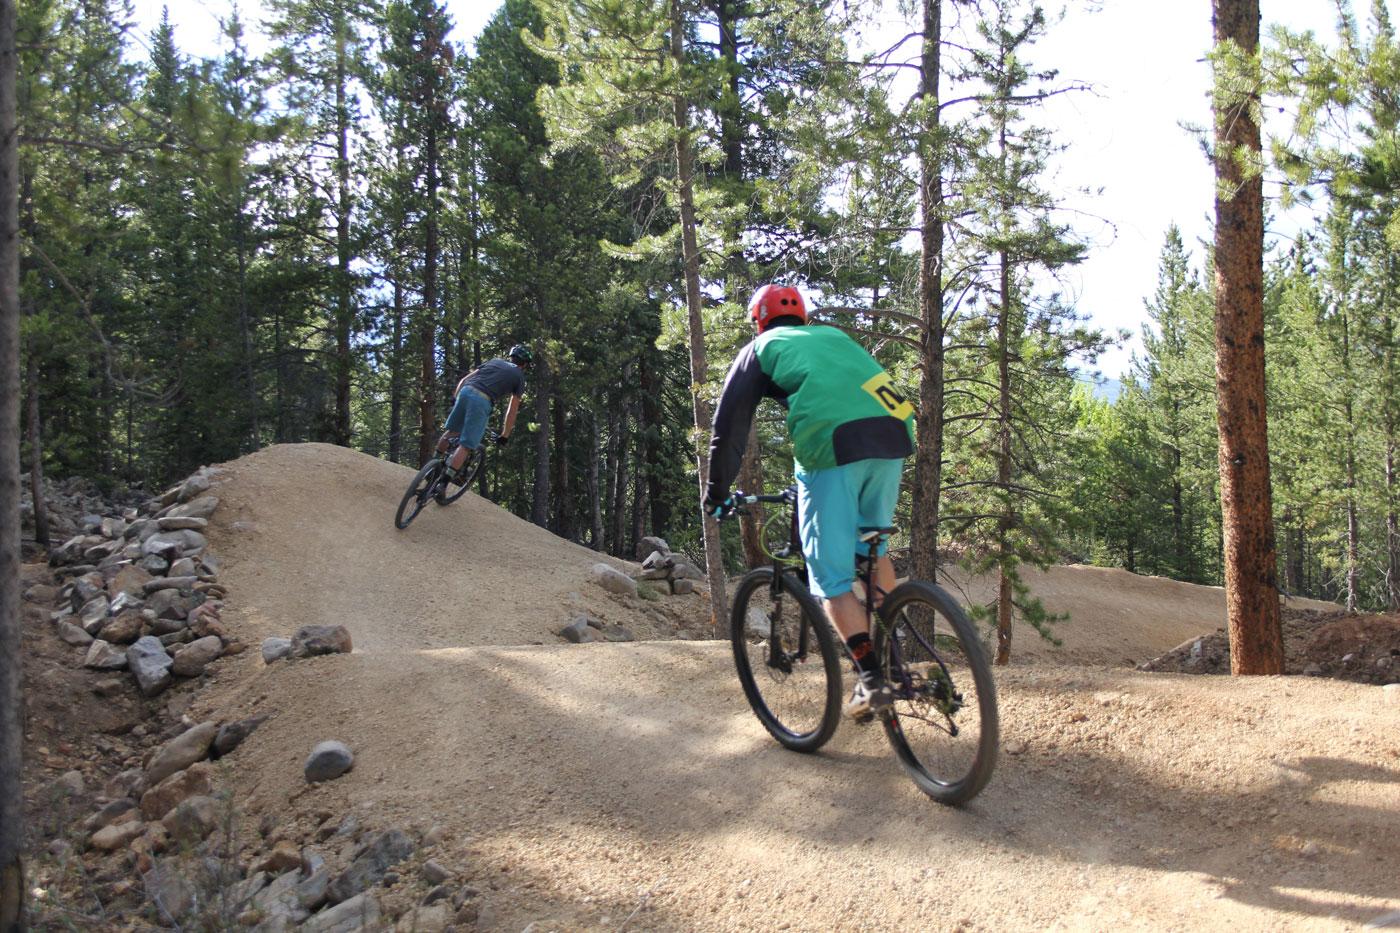 Bike Park Build | Elevated Trail Design